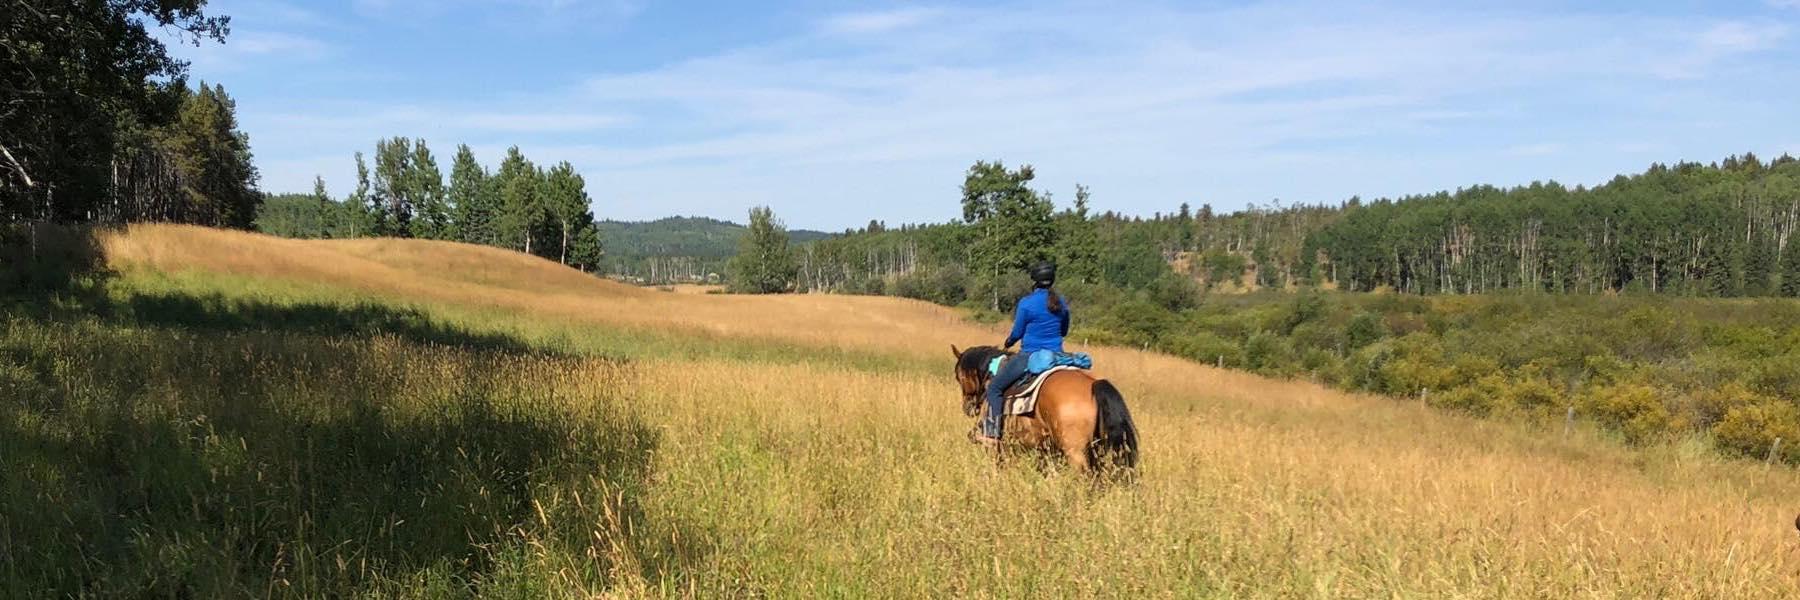 Nadine riding a horse